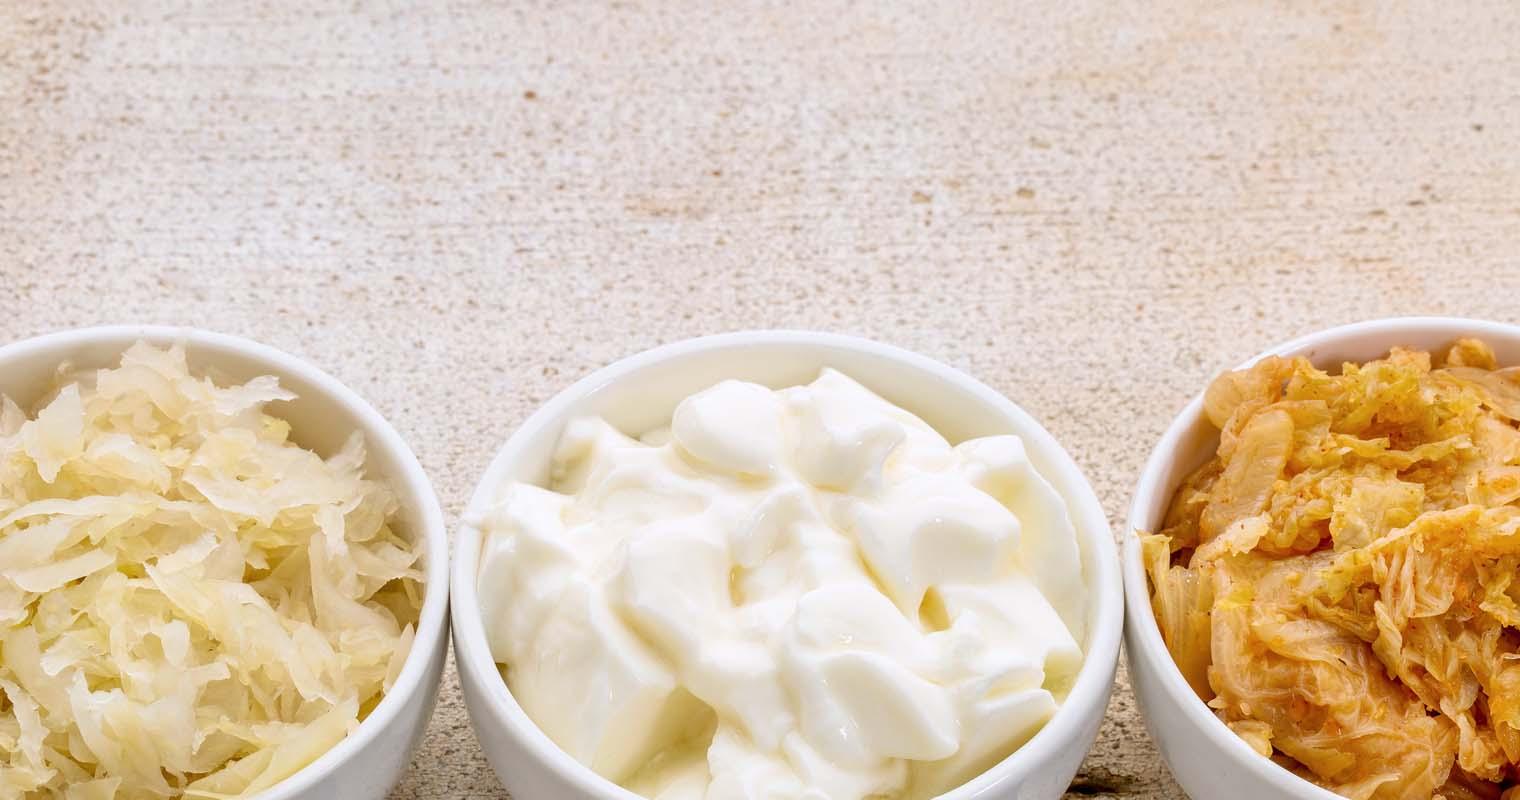 6 Signs You Need Probiotics